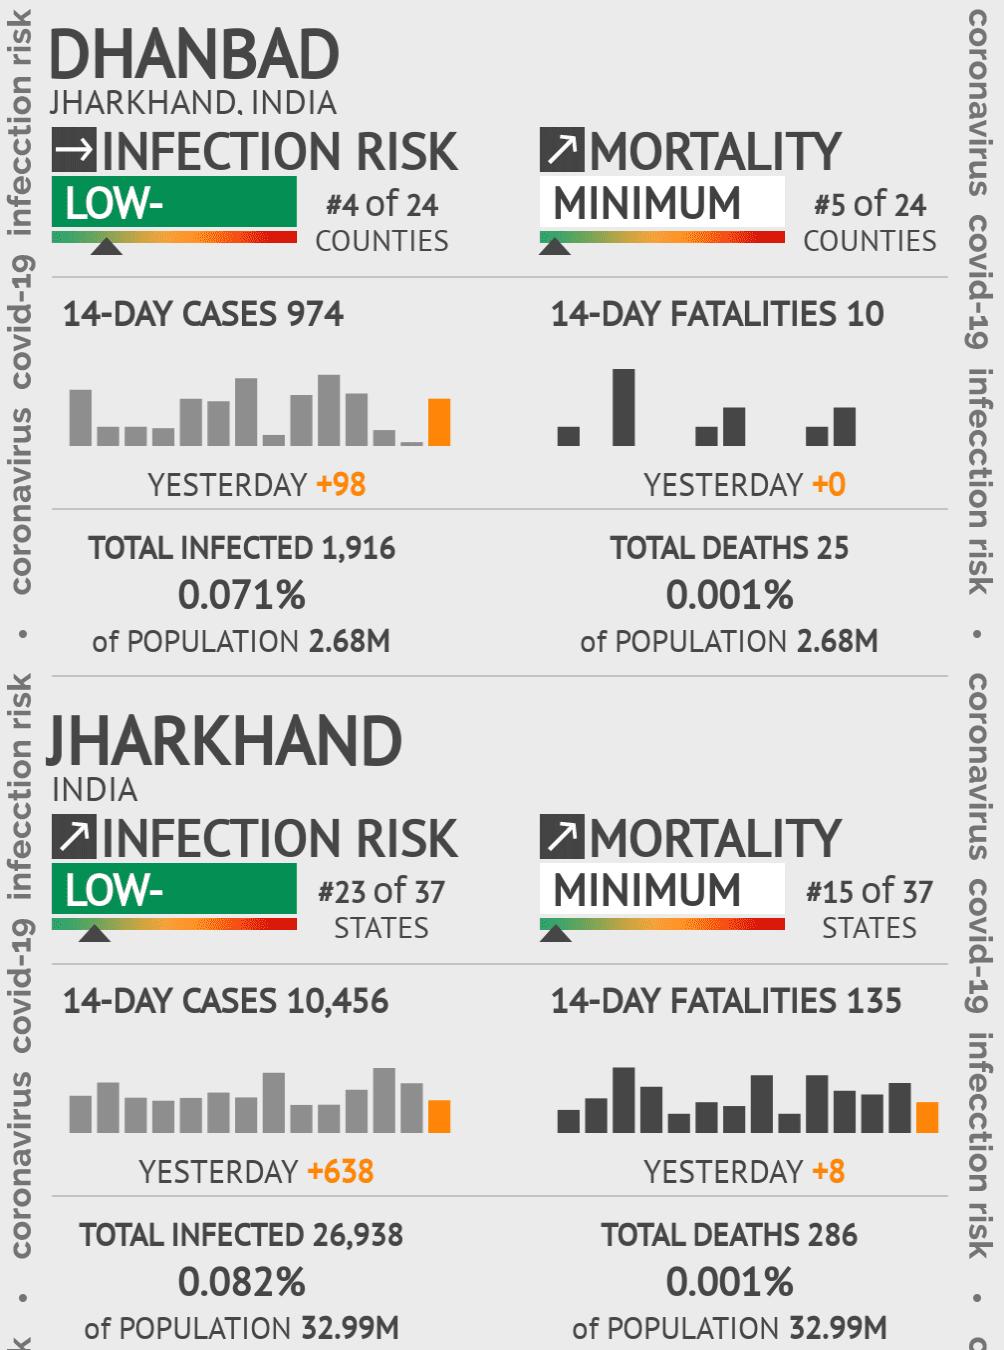 Dhanbad Coronavirus Covid-19 Risk of Infection on February 27, 2021